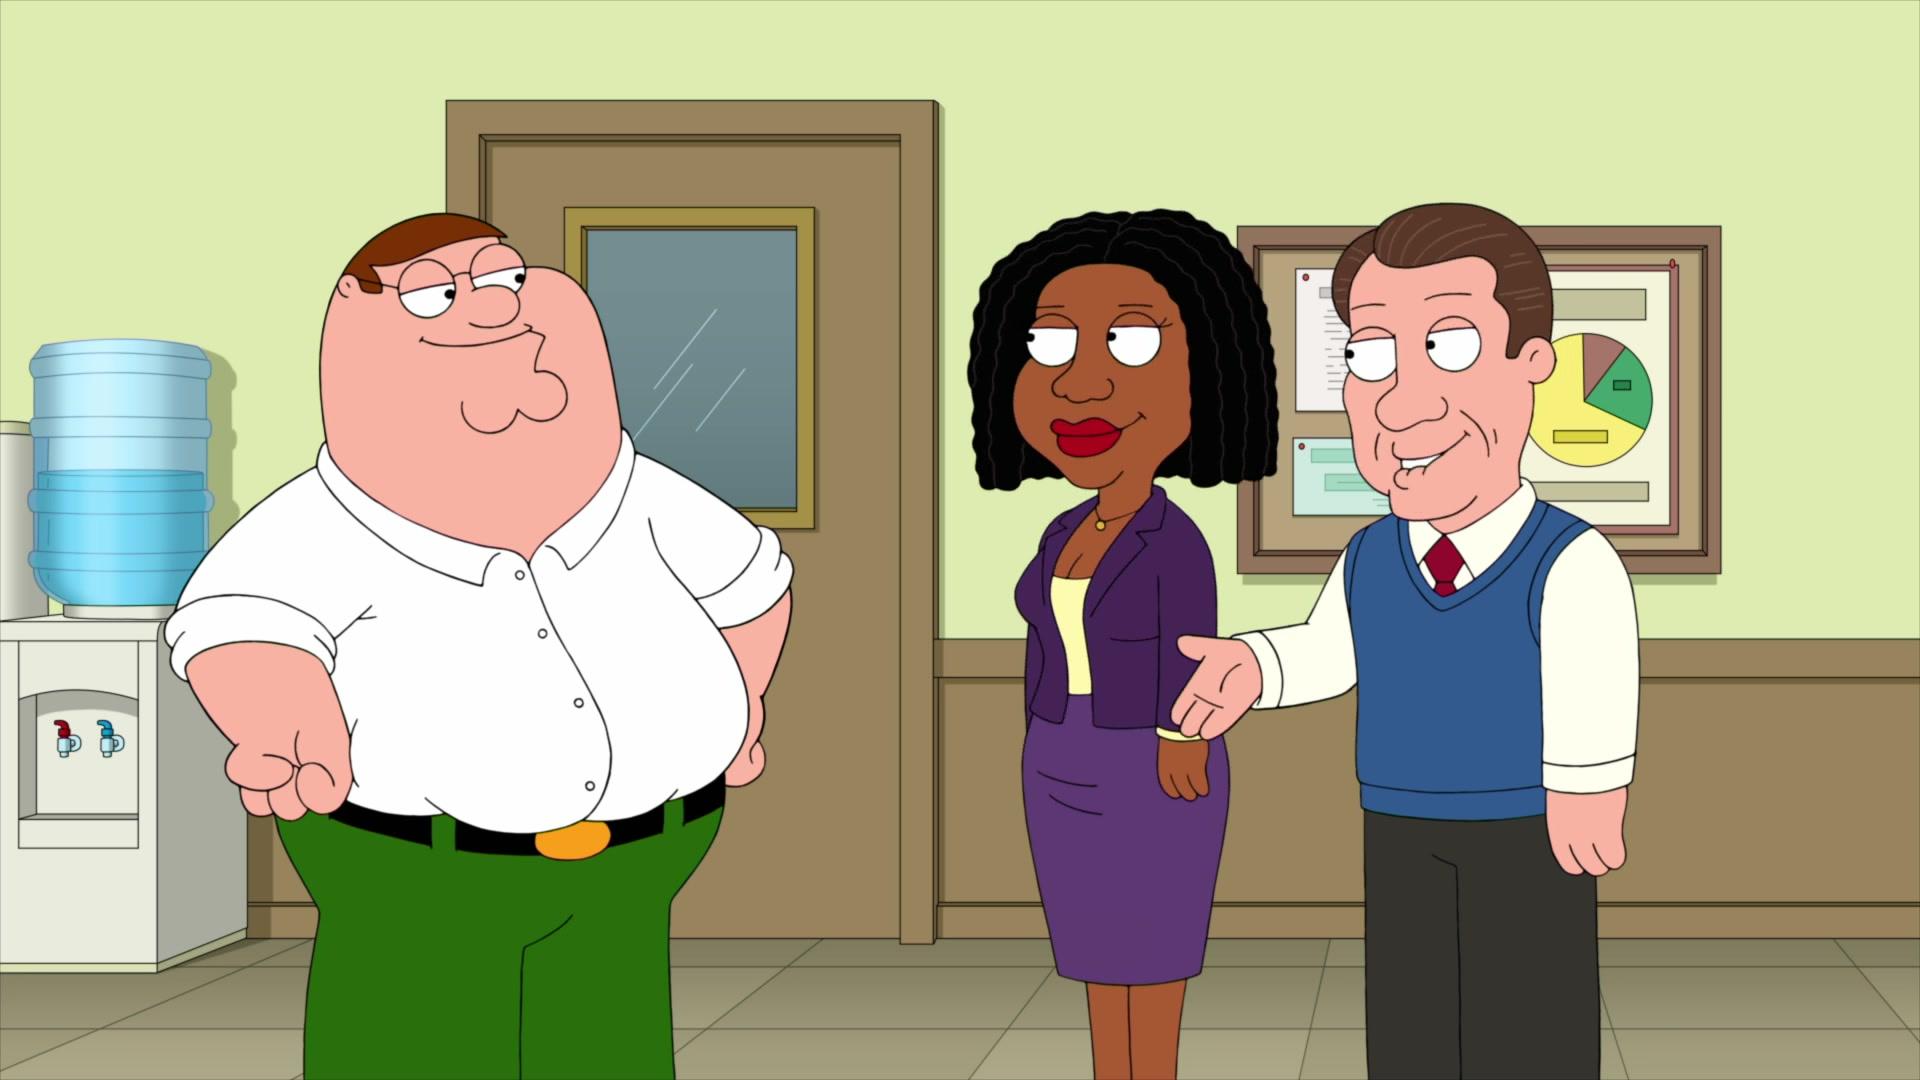 Diabeto Family Guy Episode